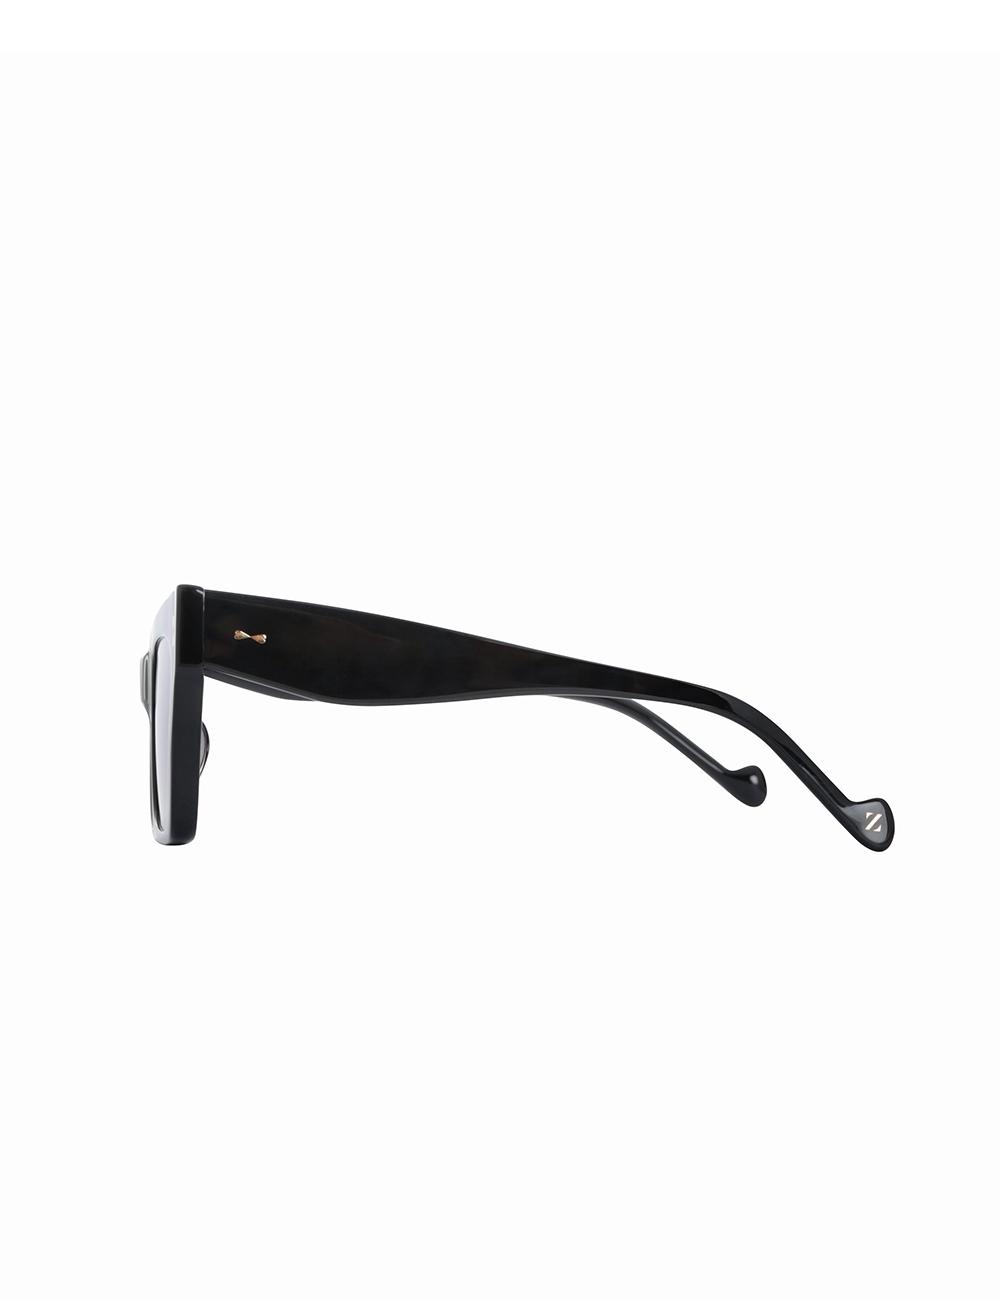 Cipher Cateye Sunglasses